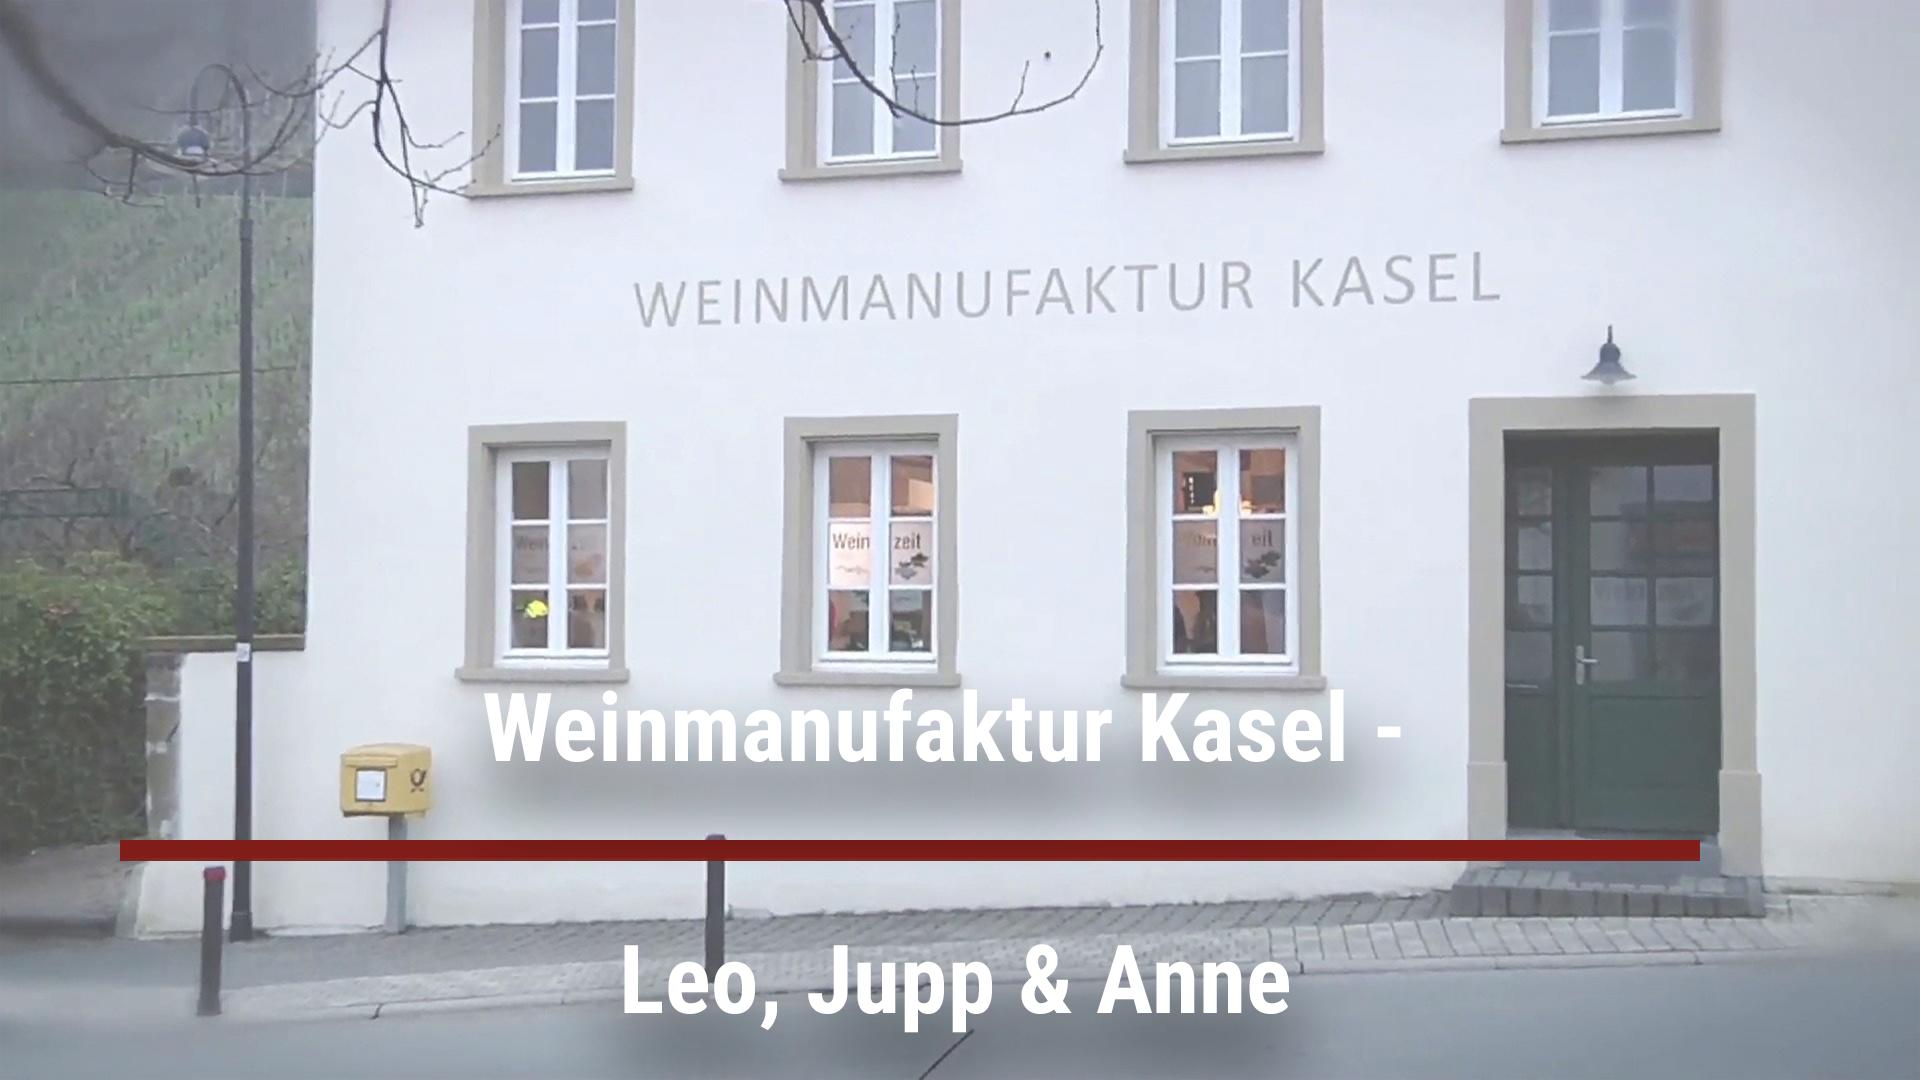 Weinmanufaktur Kasel – Leo, Jupp & Anne